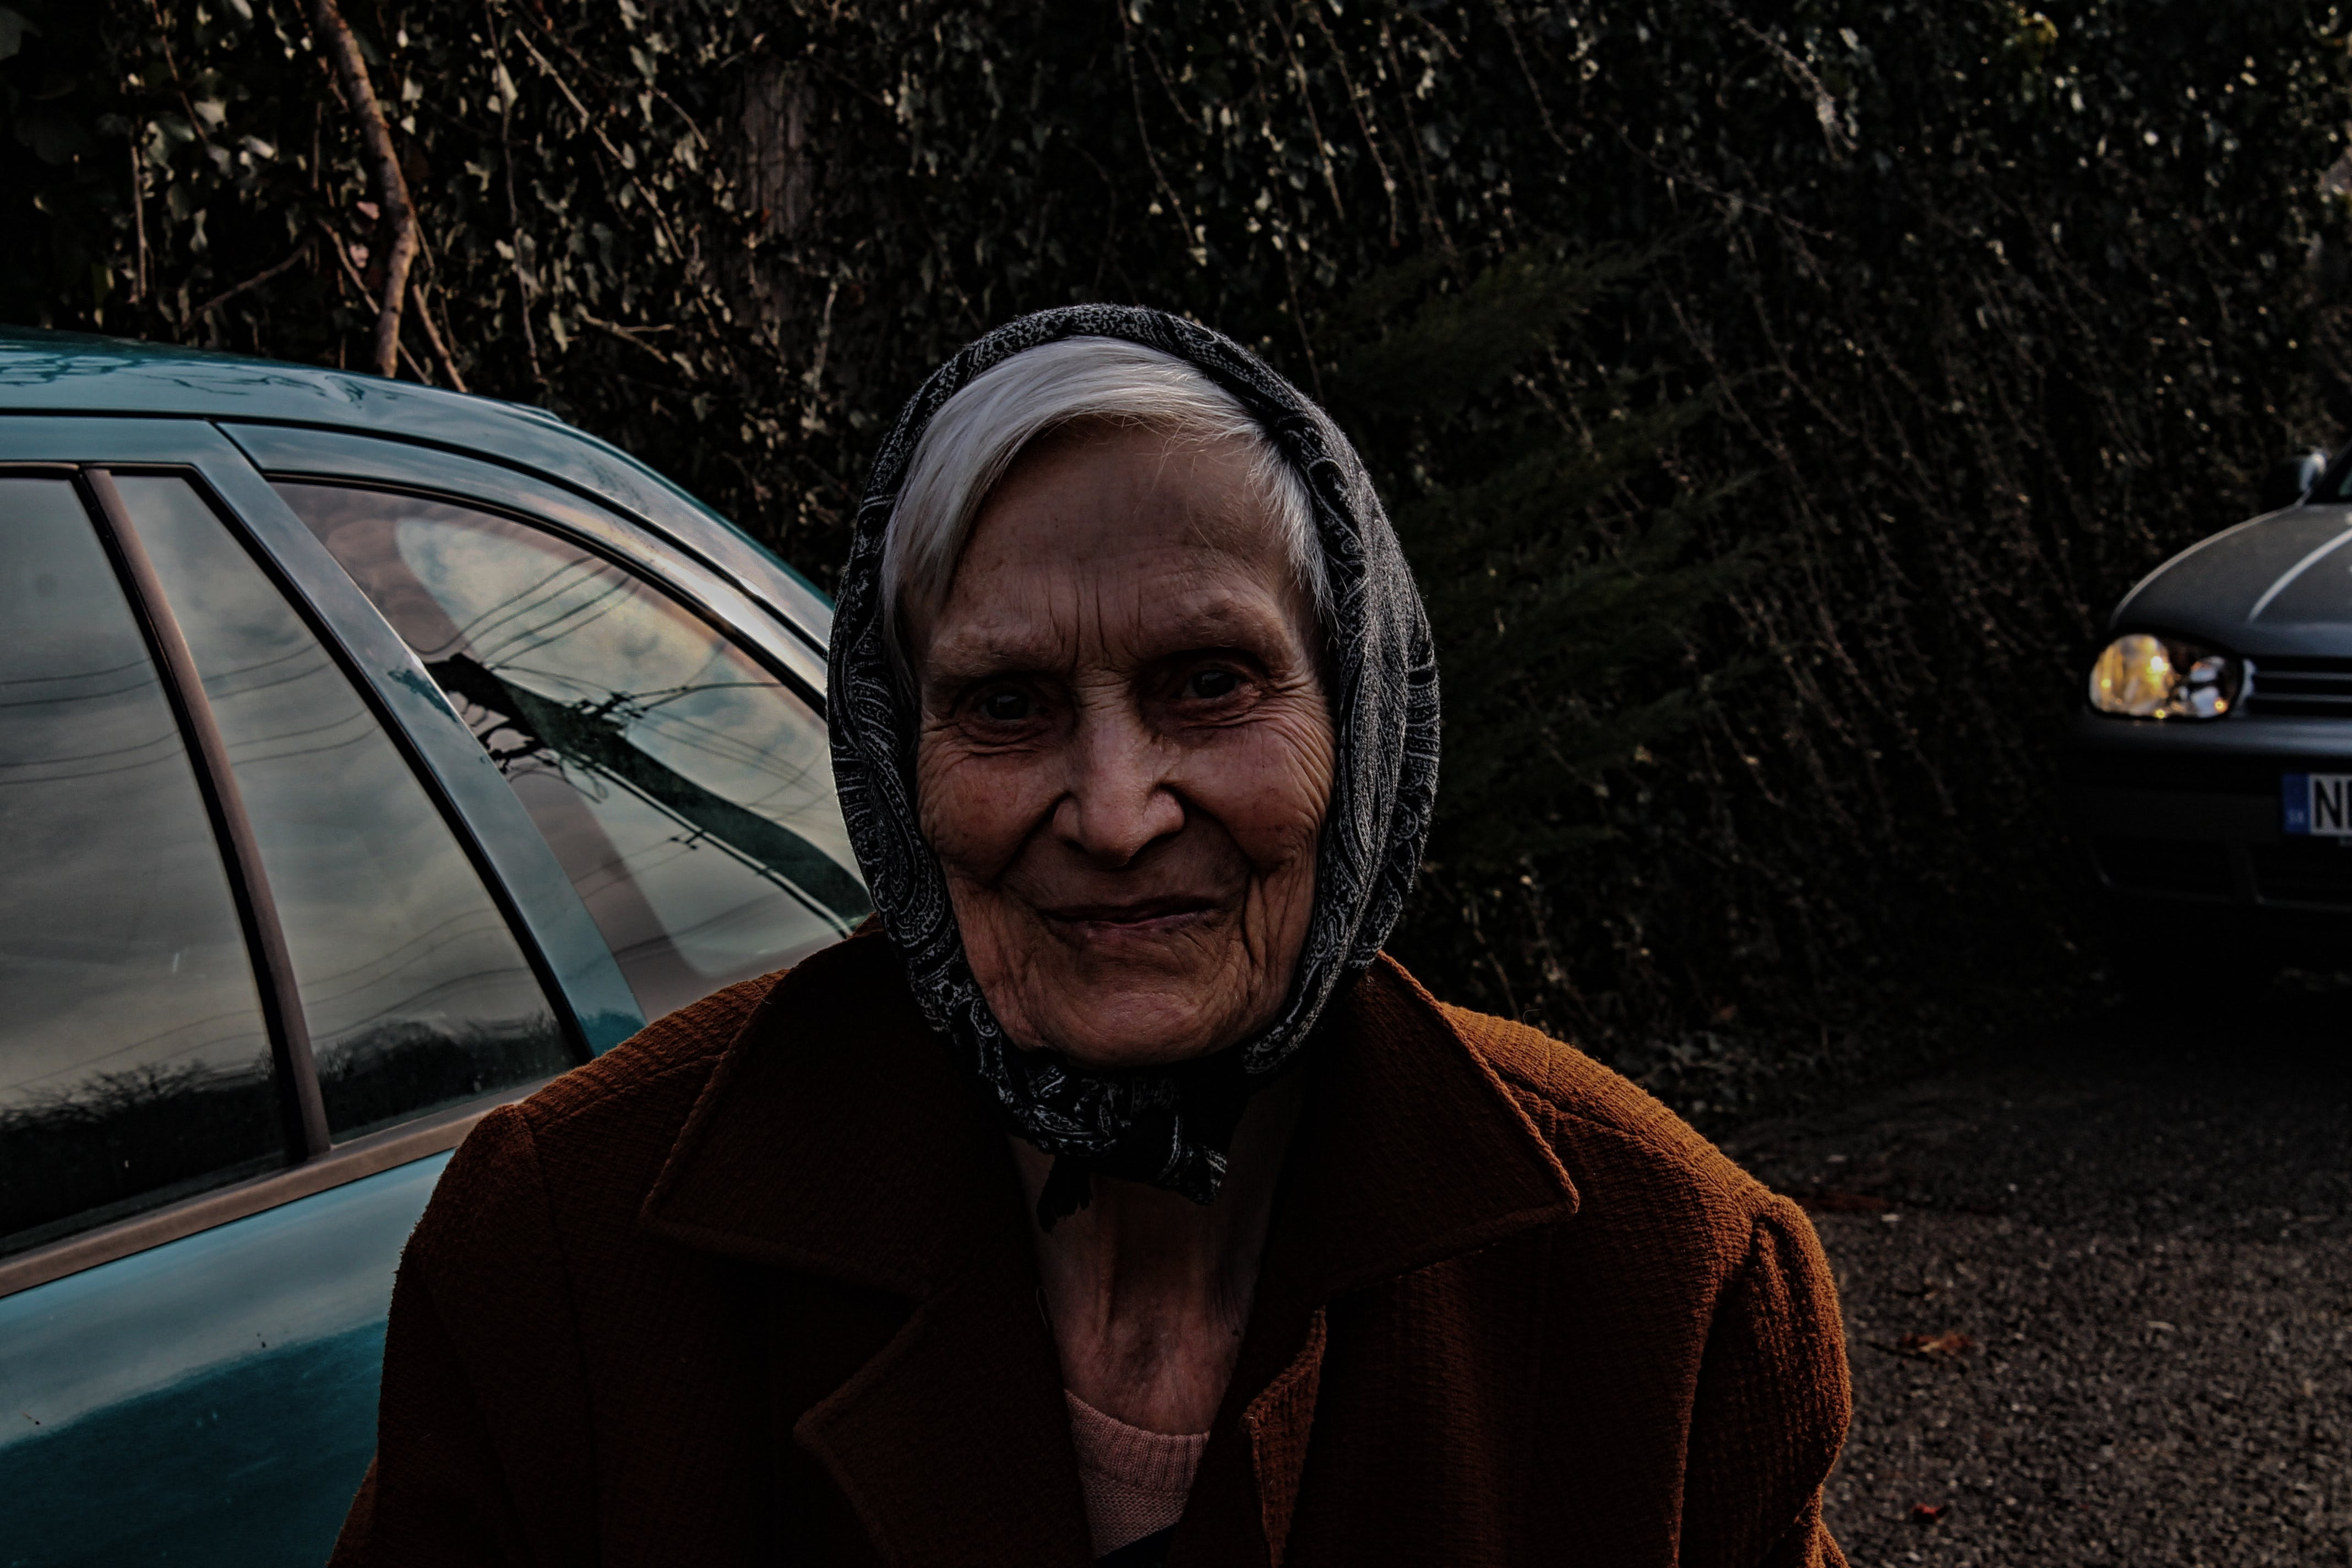 Woman Wearing Brown Jacket and Black Head Scarf